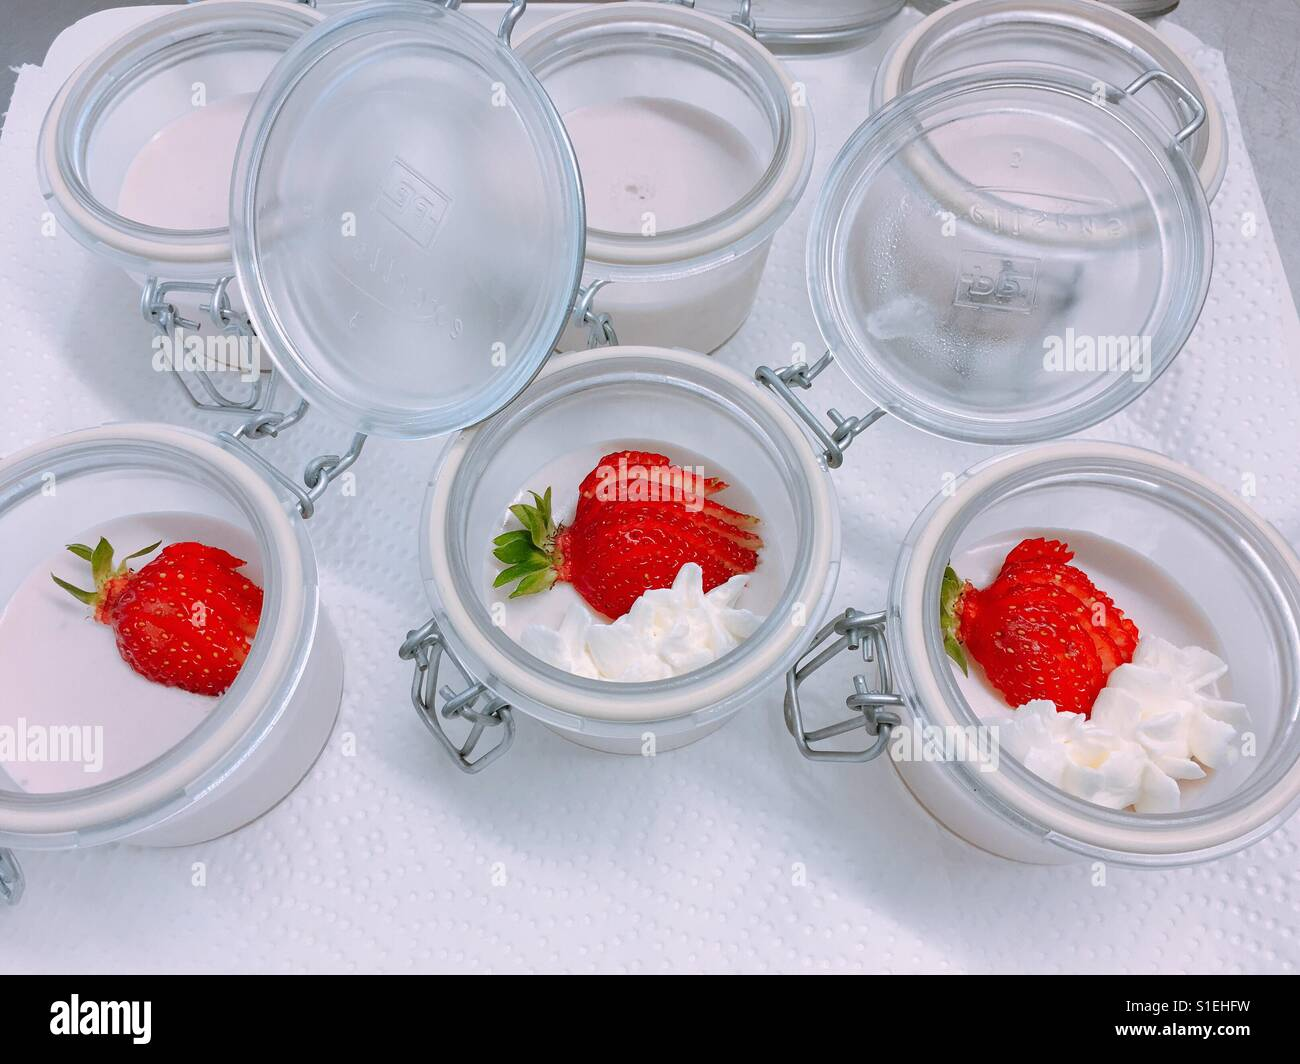 Jars with whipped cream and strawberries / Bayrisch Creme mit Erdbeeren - Stock Image